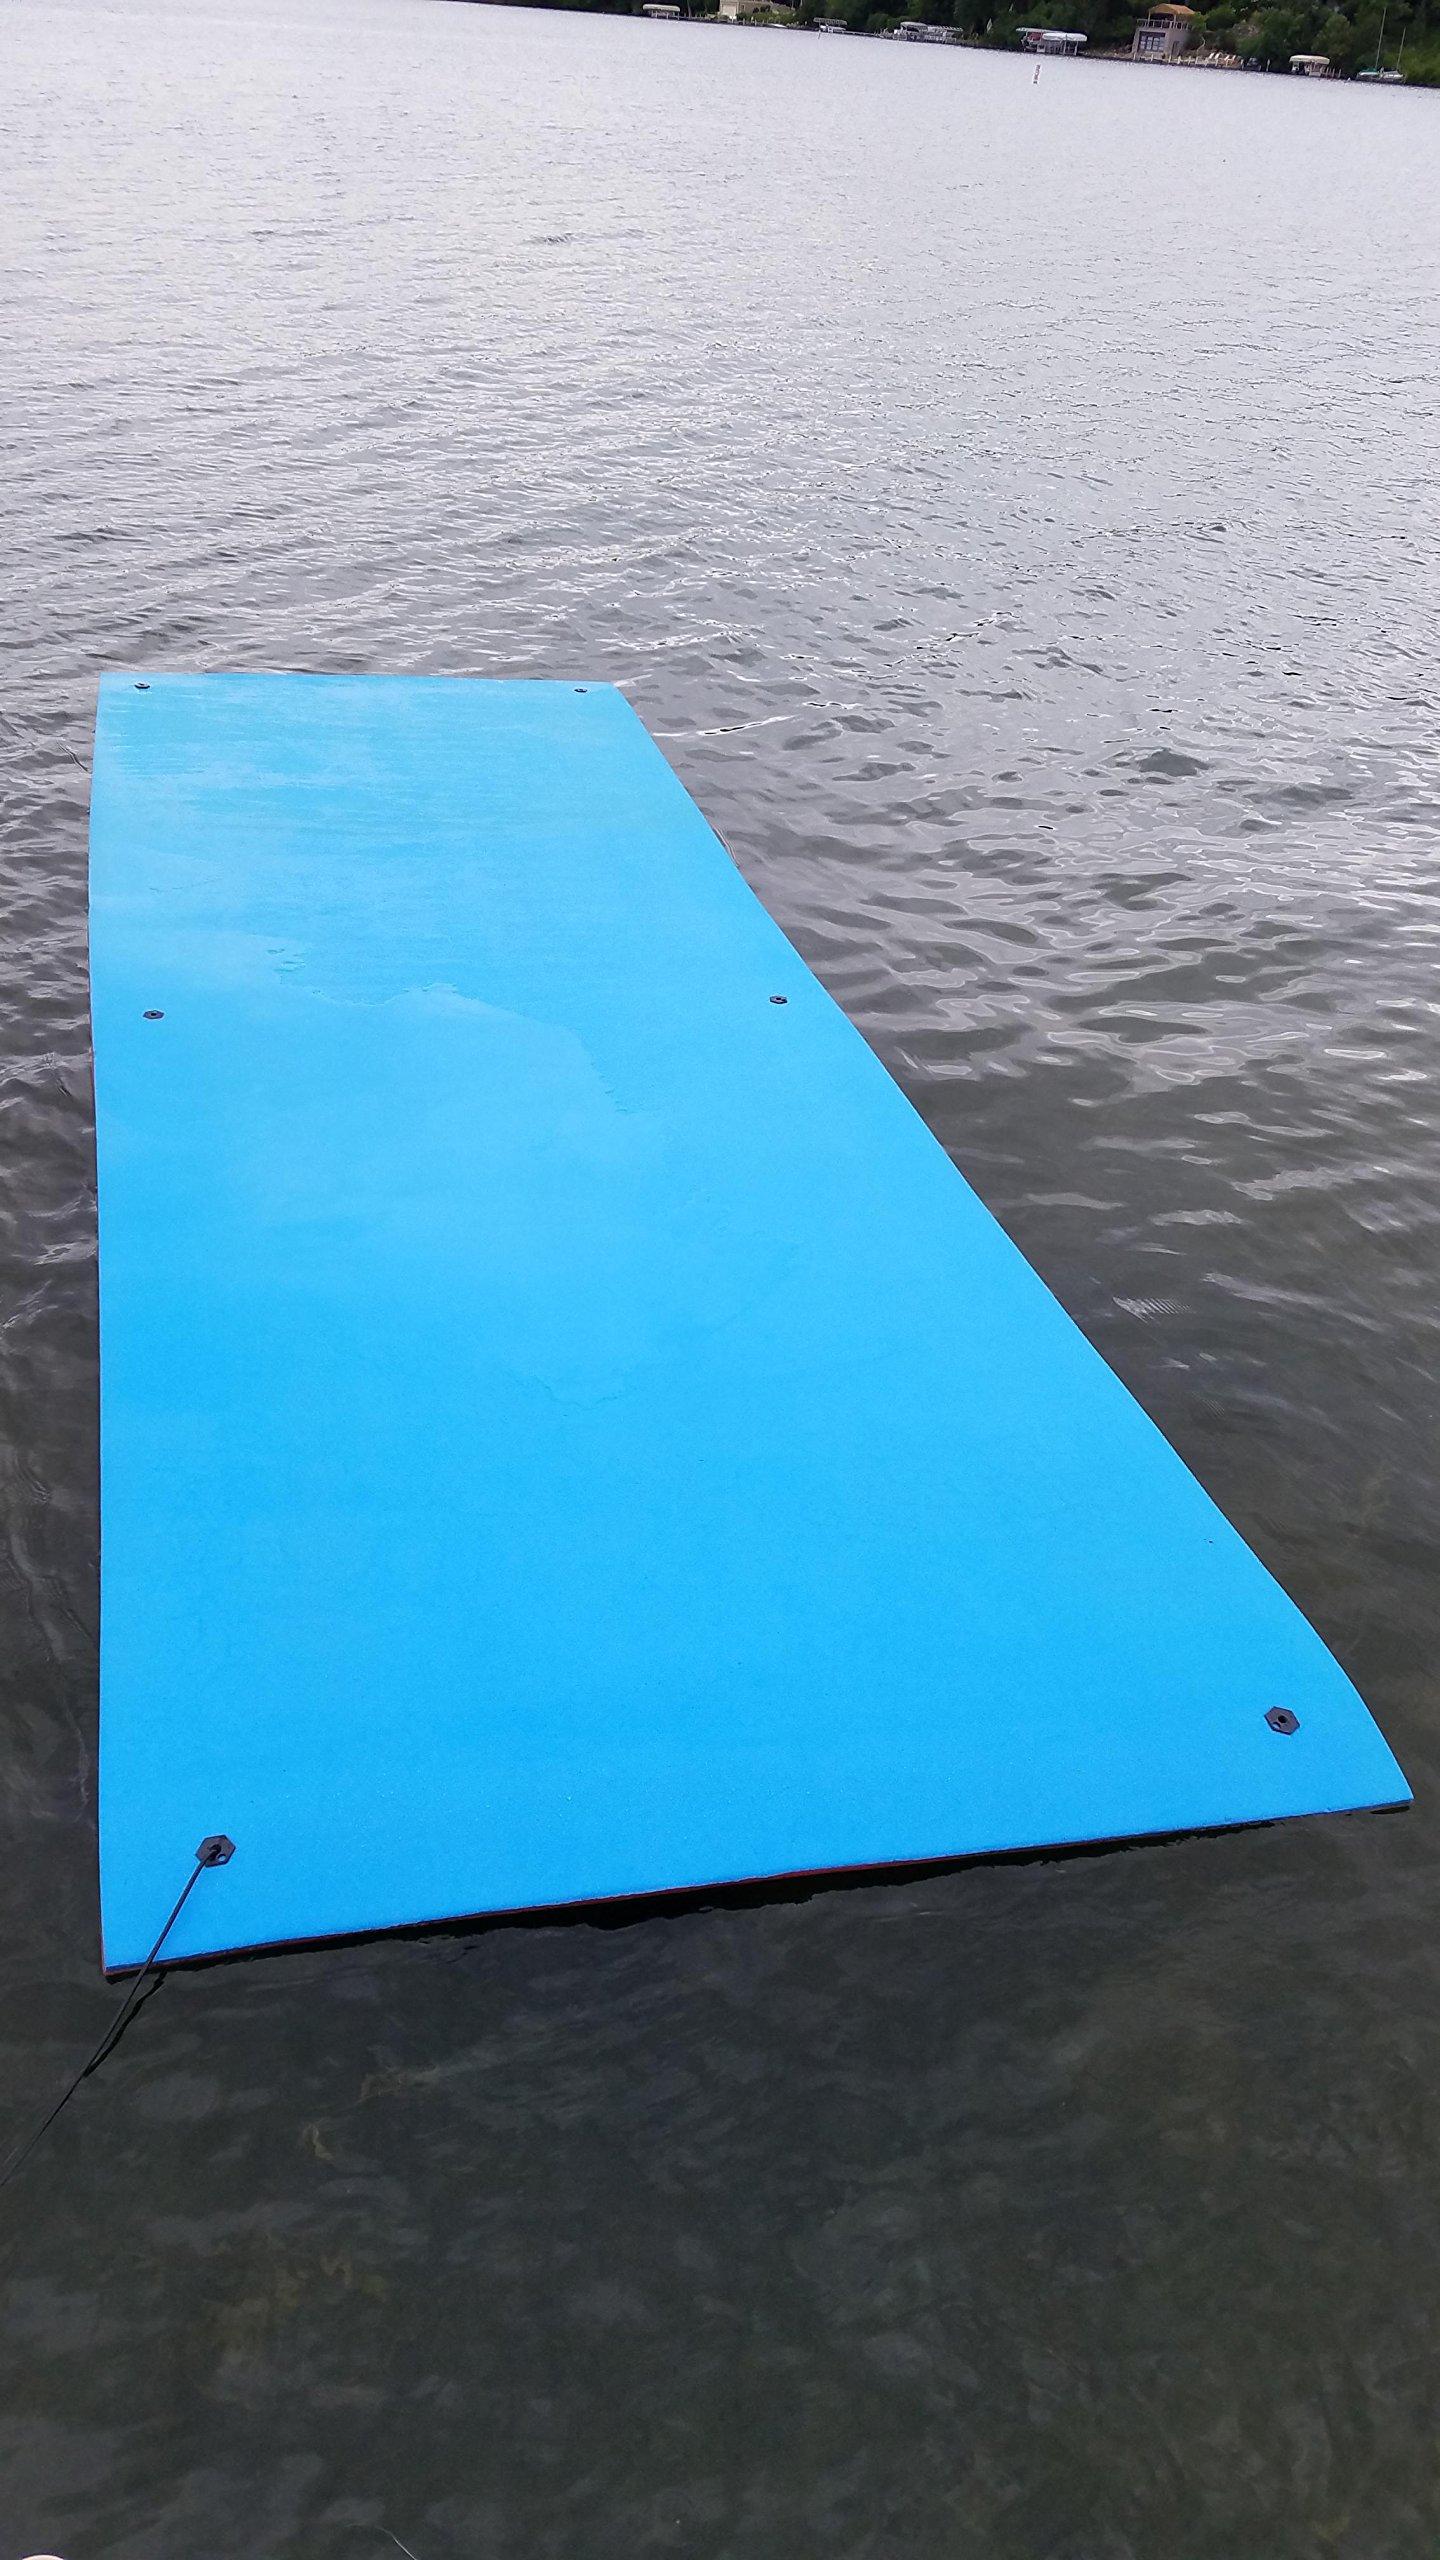 Vico Marine Floating Foam Pad - Red/Blue by Vico Marine (Image #3)